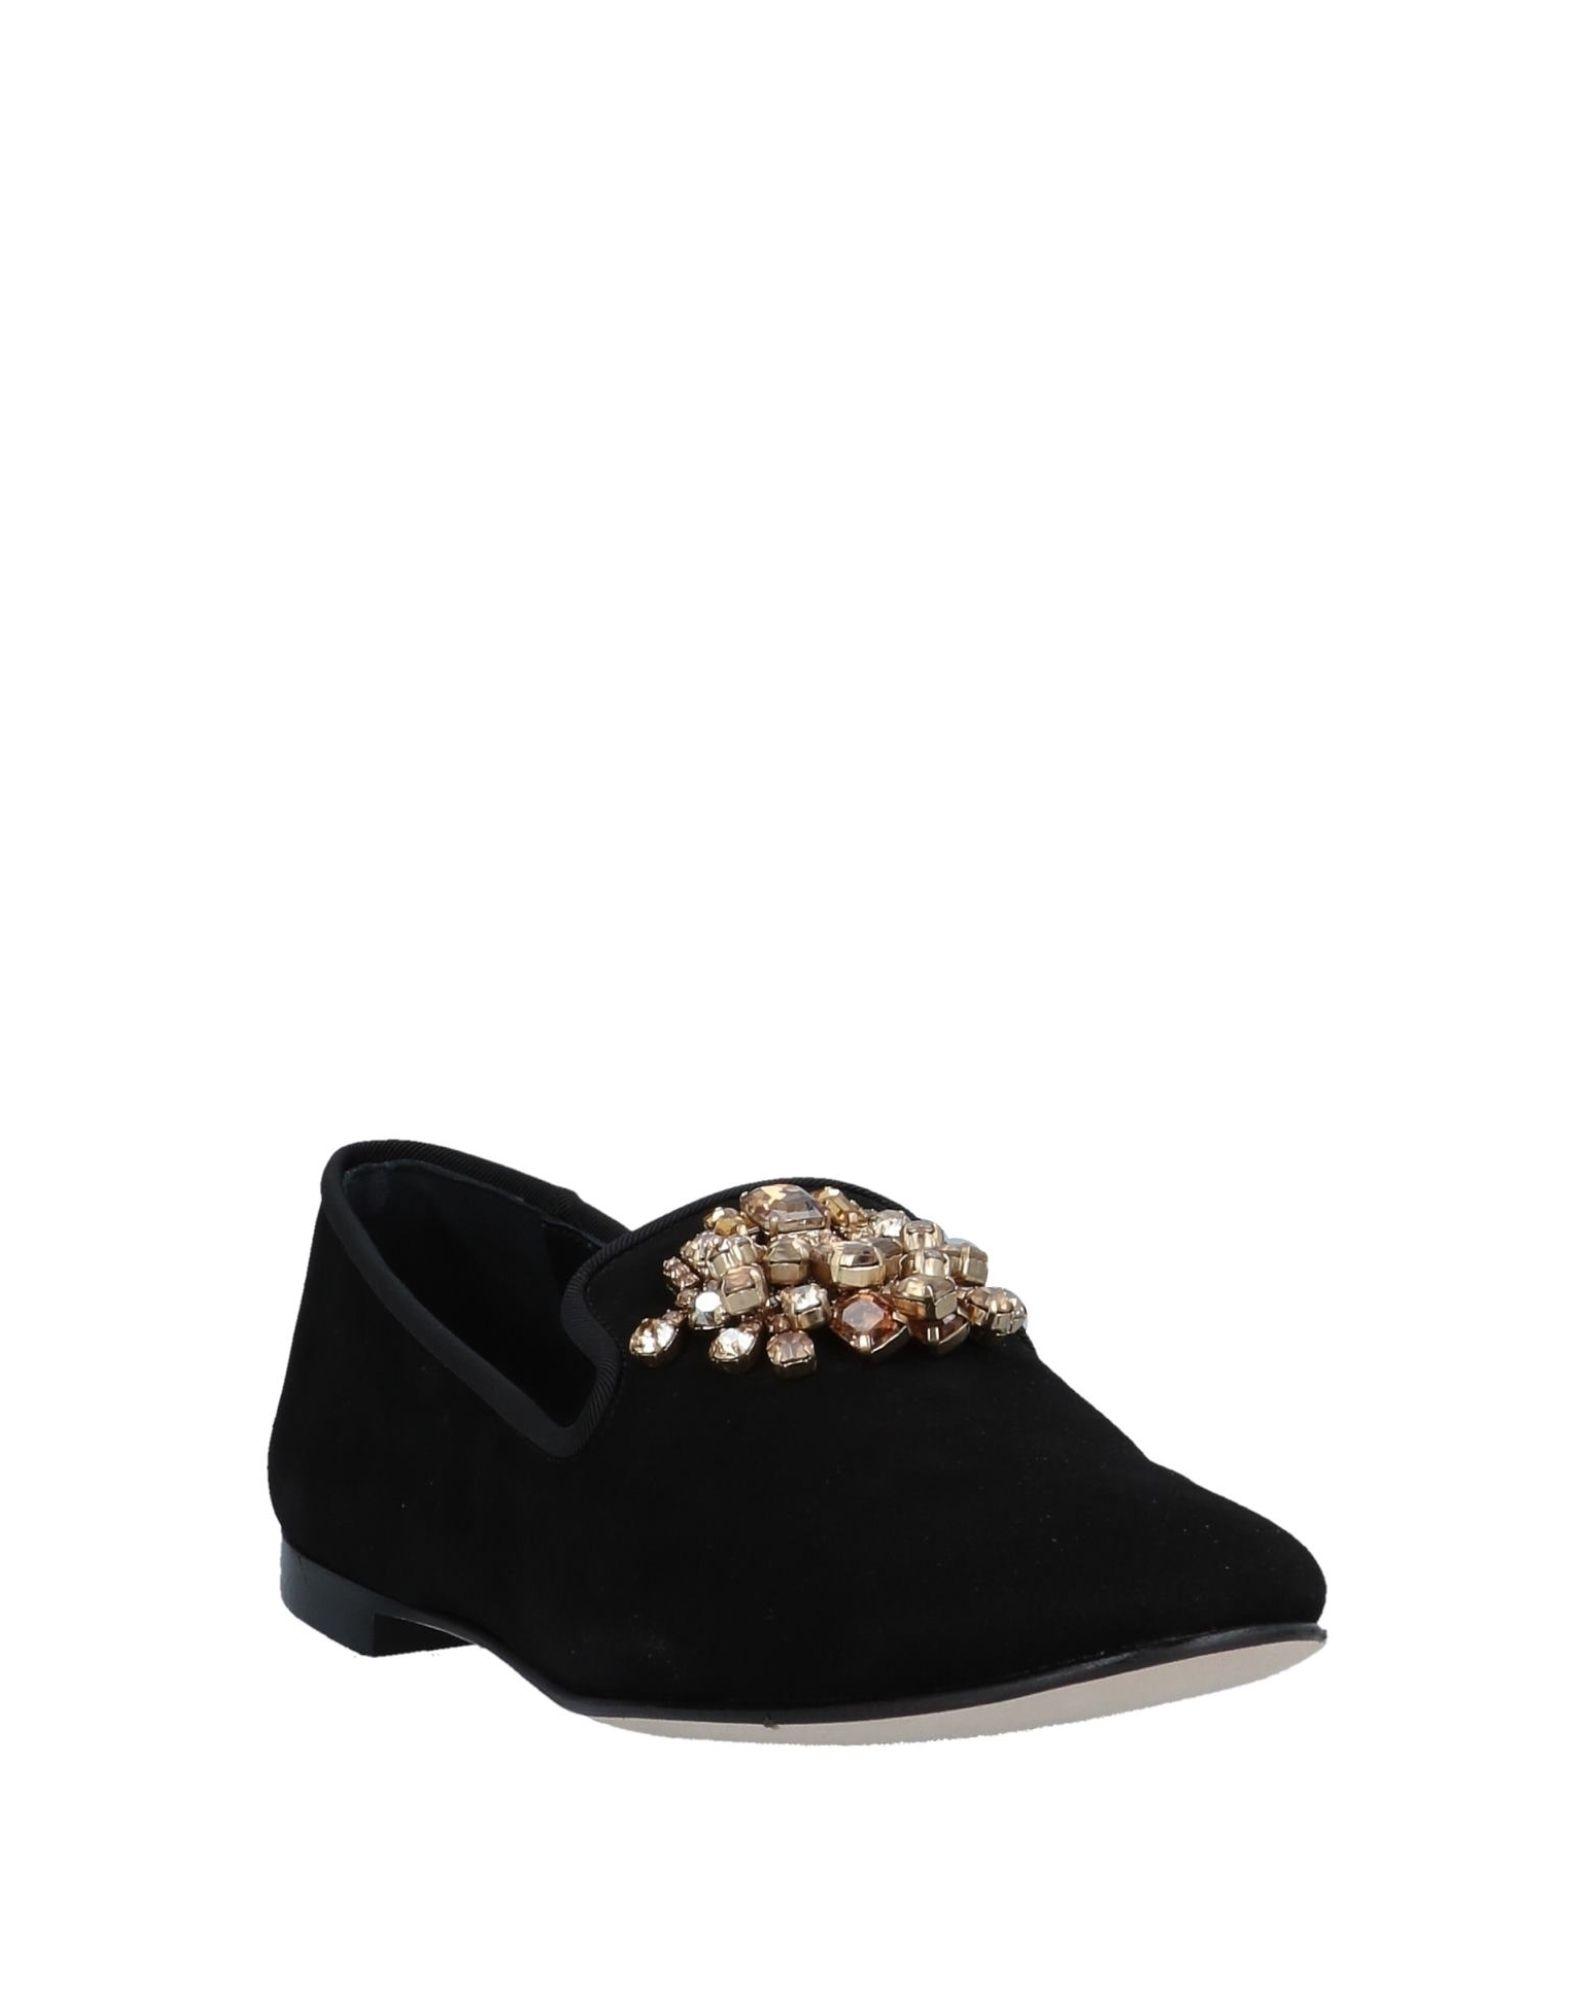 Giuseppe Zanotti Mokassins Damen aussehende  11553618JLGünstige gut aussehende Damen Schuhe 05f163